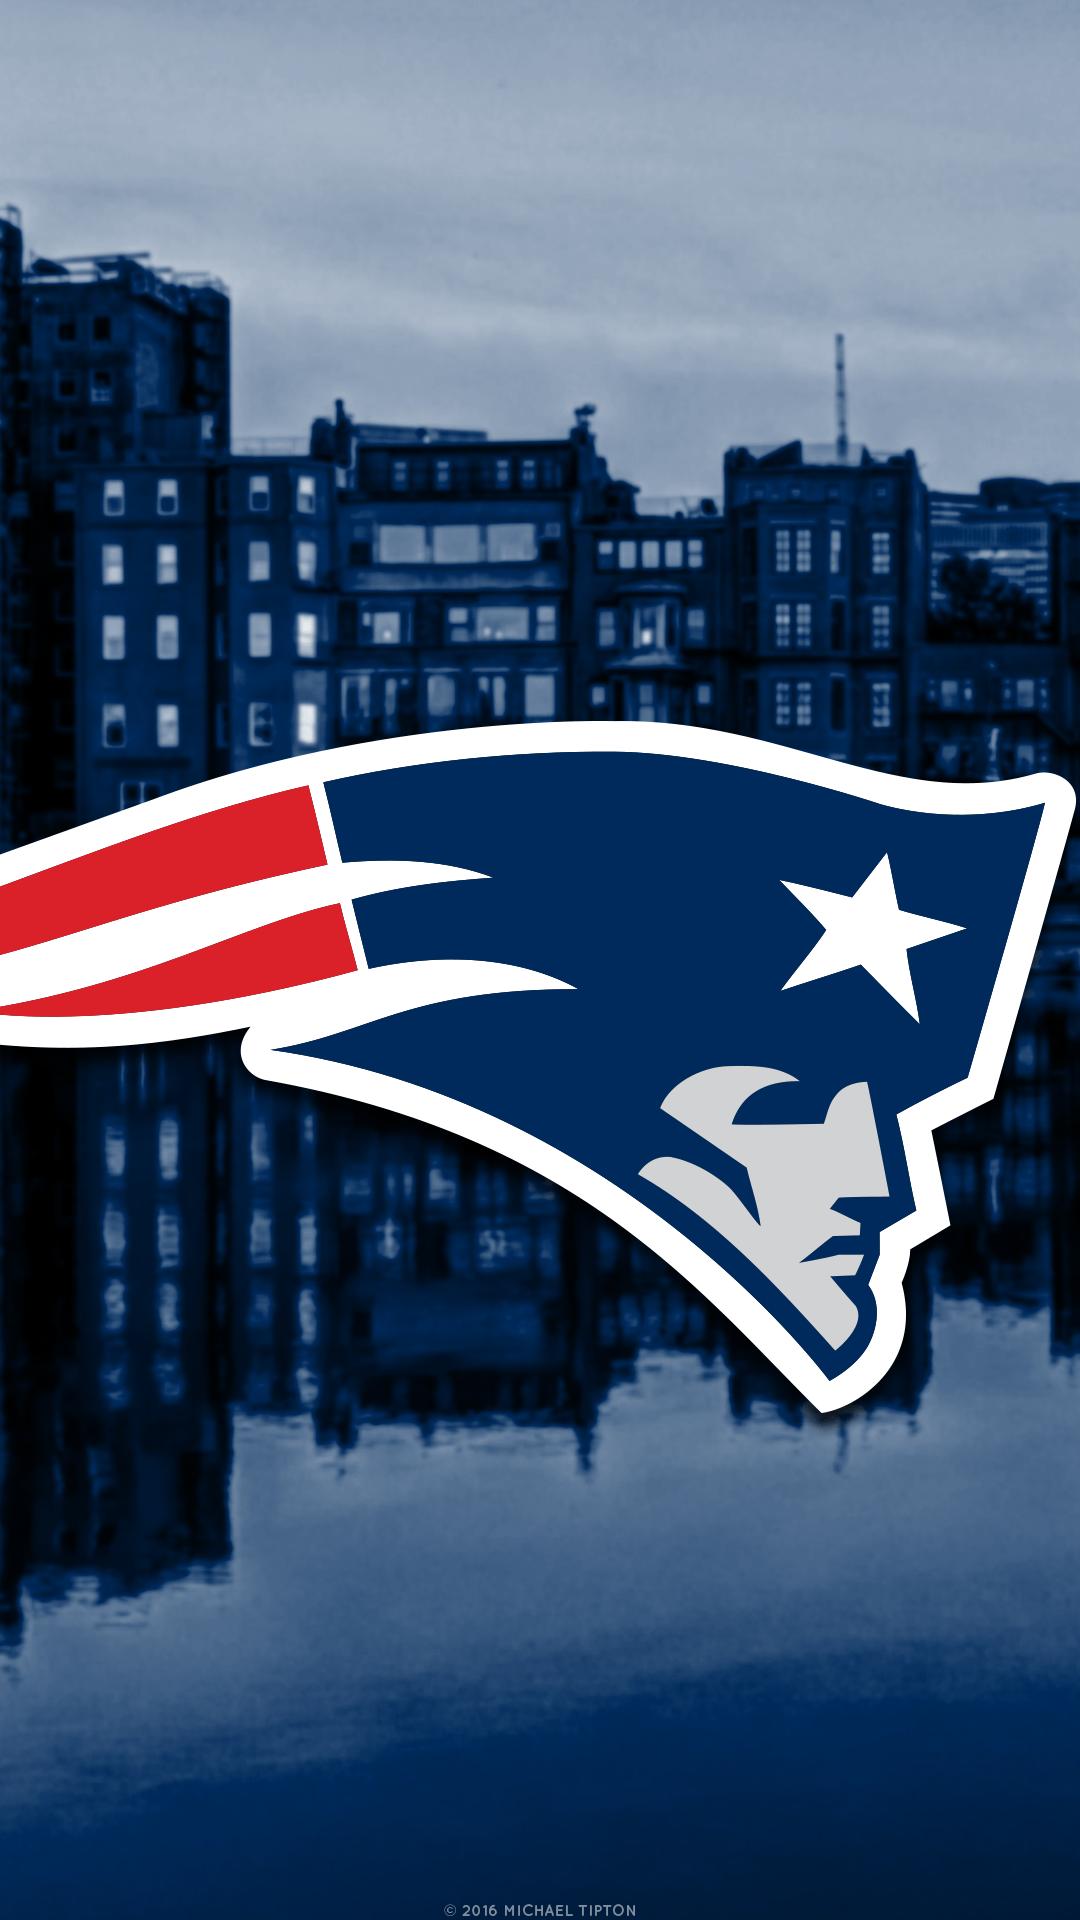 New England Patriots 2017 Wallpapers - Wallpaper Cave